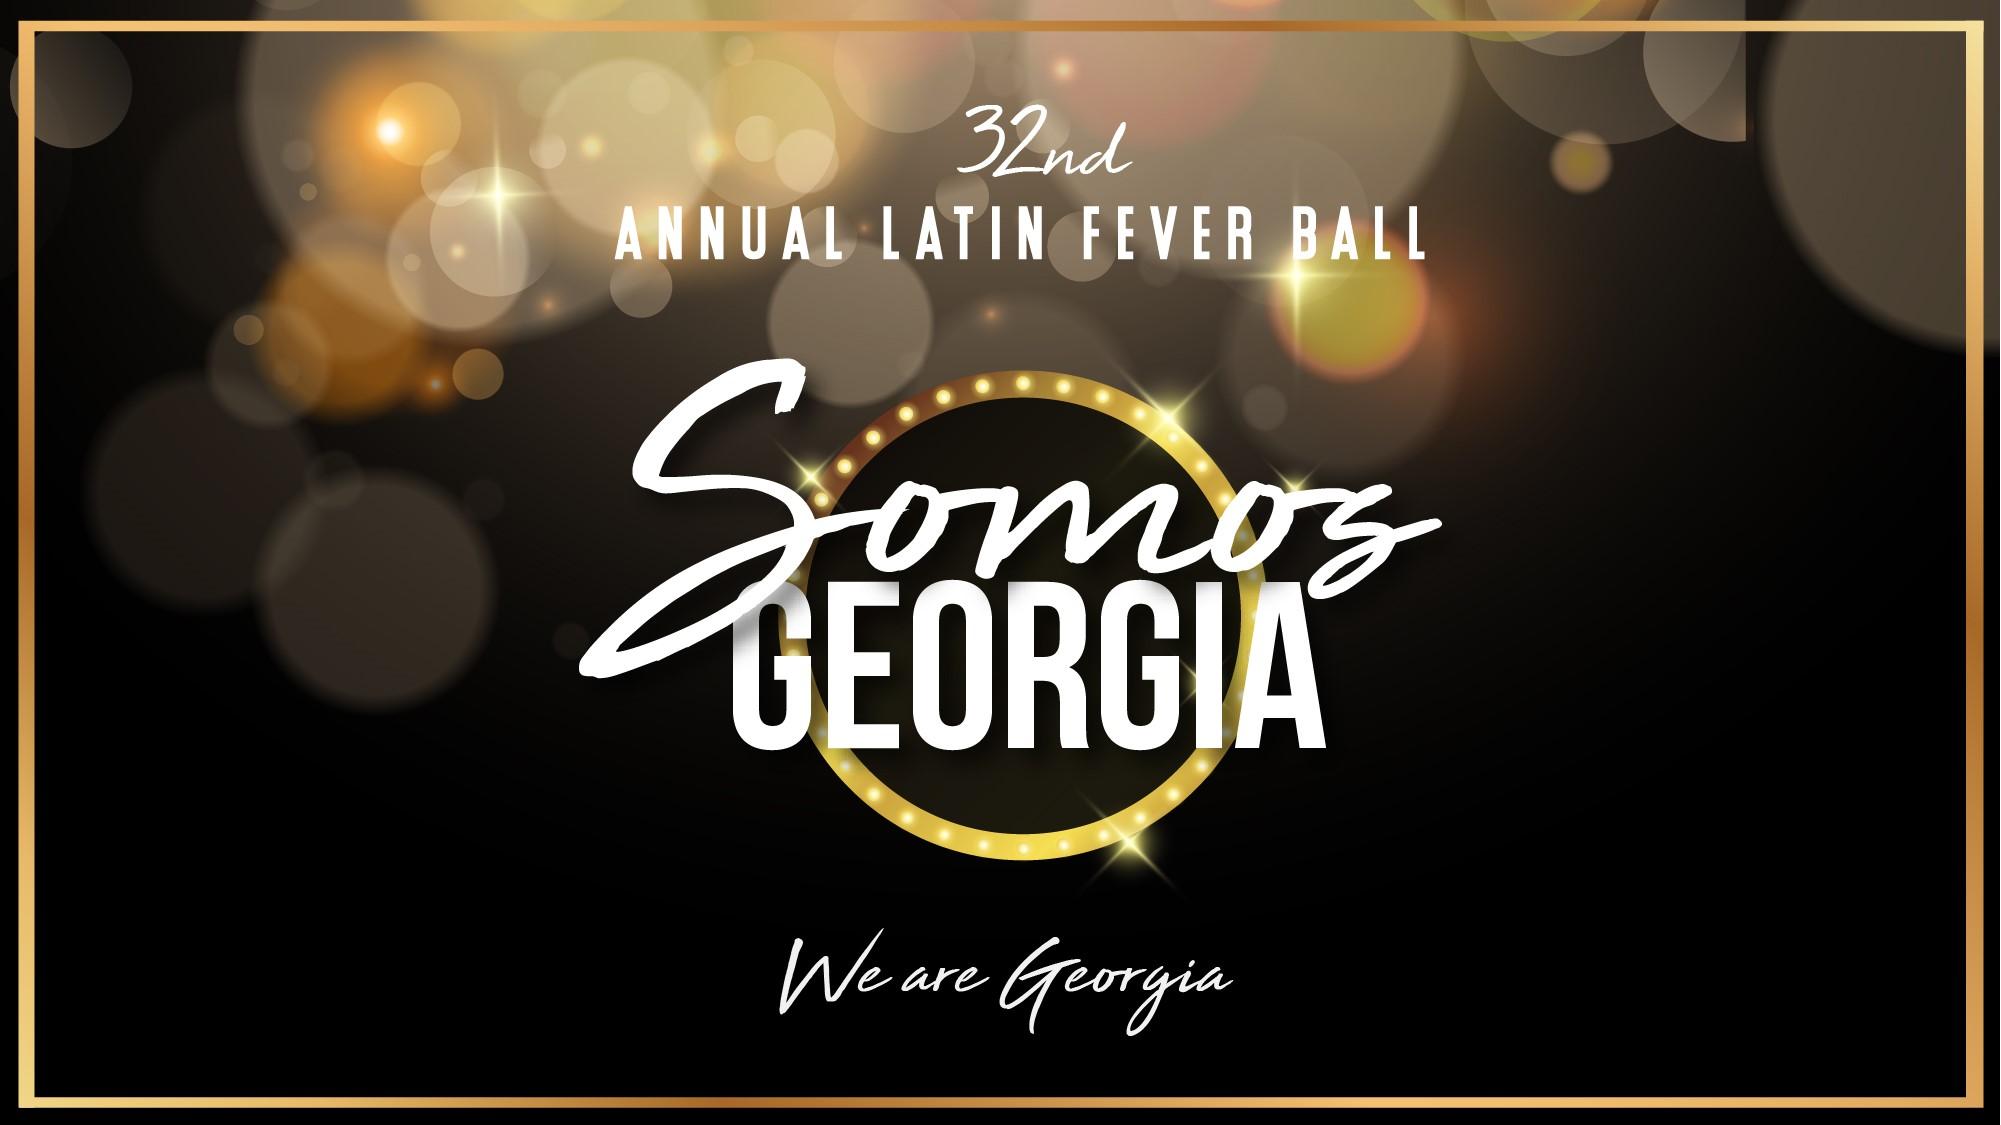 latin fever ball 2020 latin american association